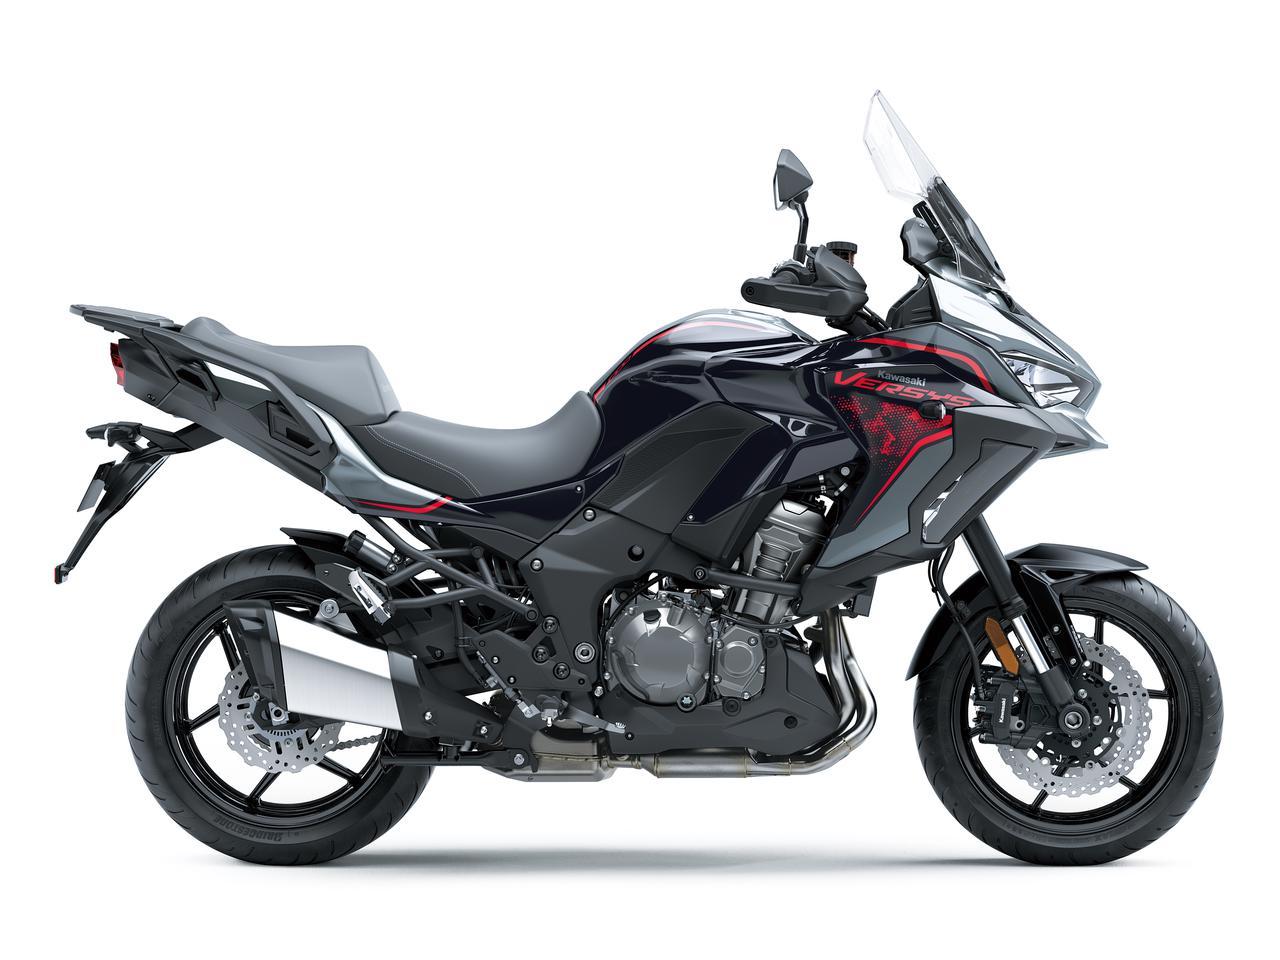 Images : 6番目の画像 - 写真をもっと見る! カワサキ「ヴェルシス1000S」(2021年モデル・欧州仕様車) - LAWRENCE - Motorcycle x Cars + α = Your Life.